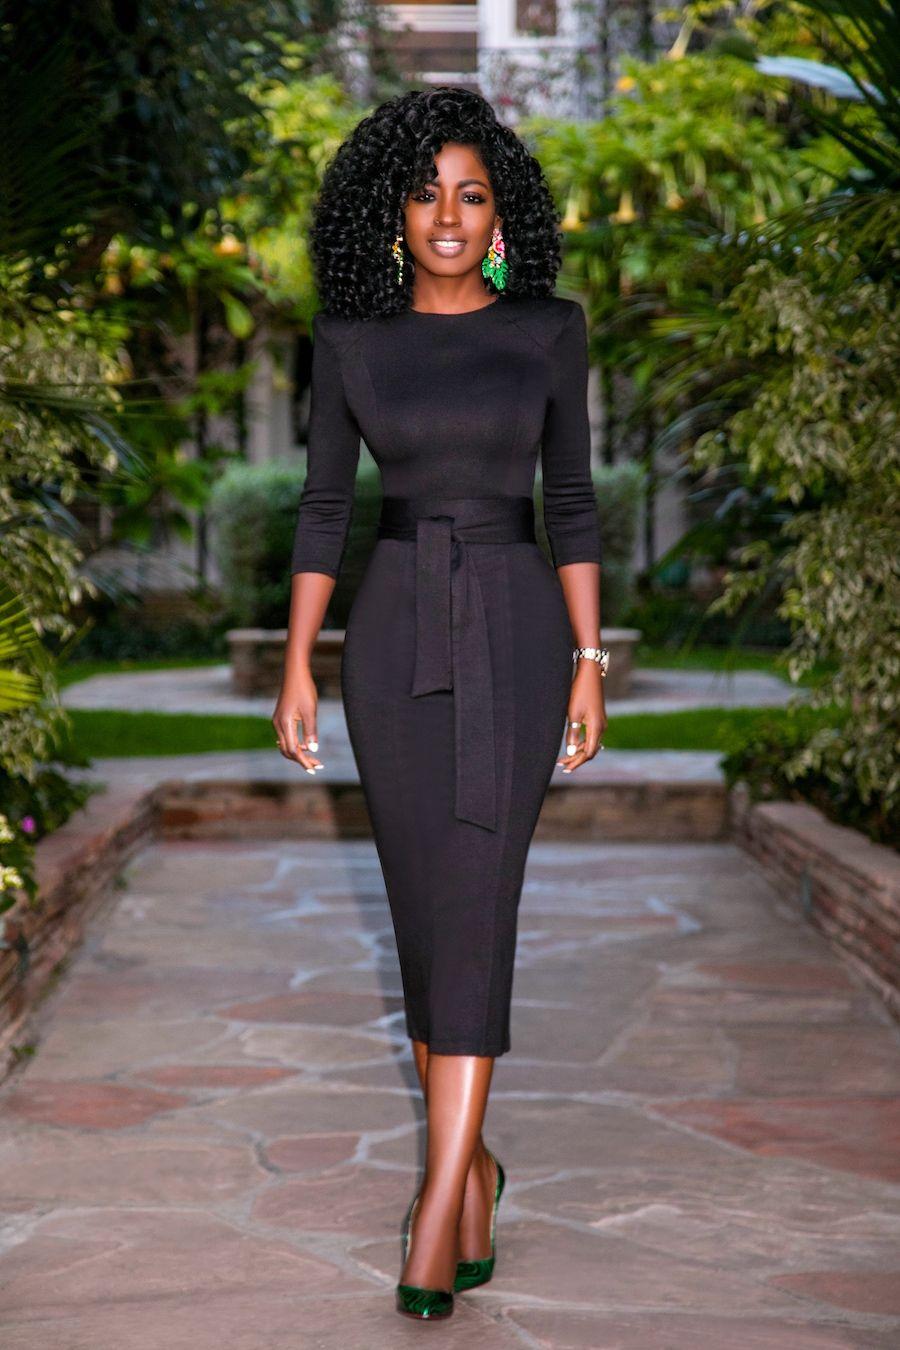 Shoulder Pad Midi Dress Fashion Black Women Fashion Fashion Dresses [ 1350 x 900 Pixel ]